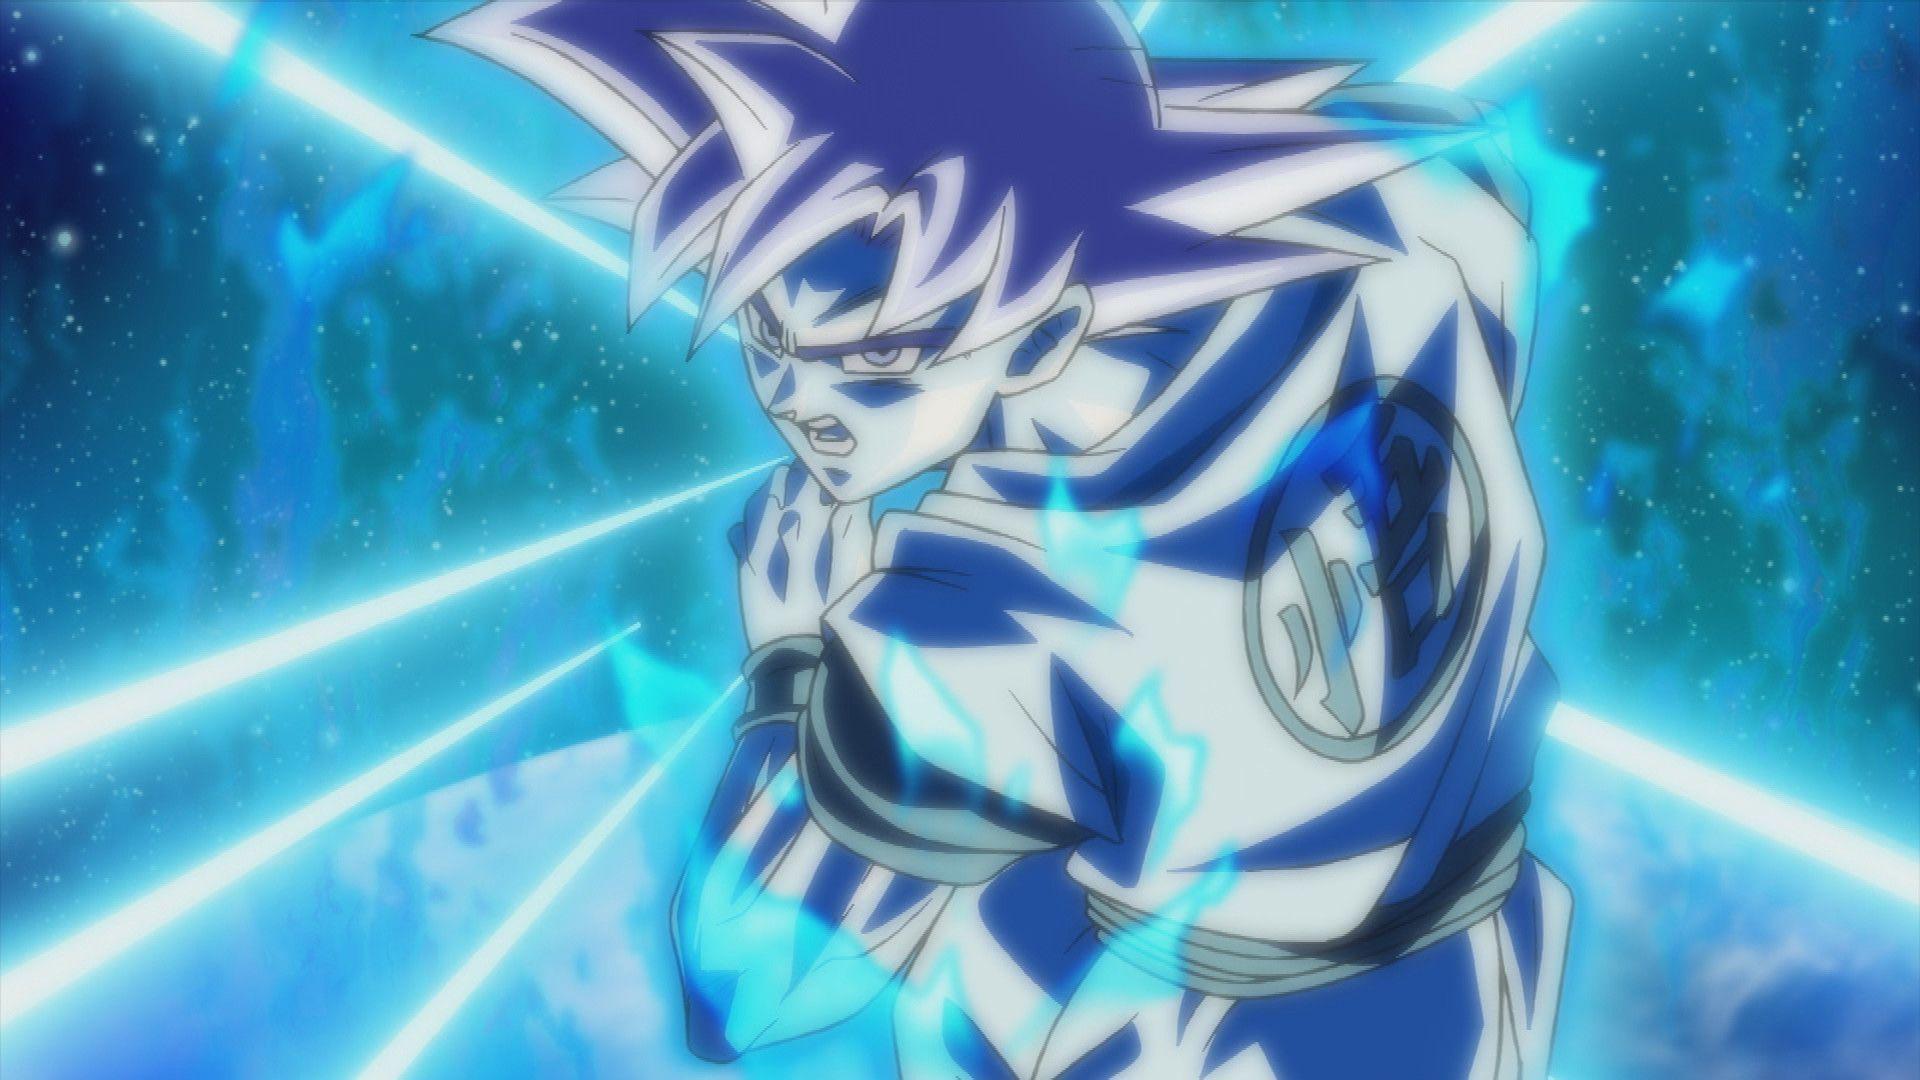 Goku Blue Wallpapers - Wallpaper Cave